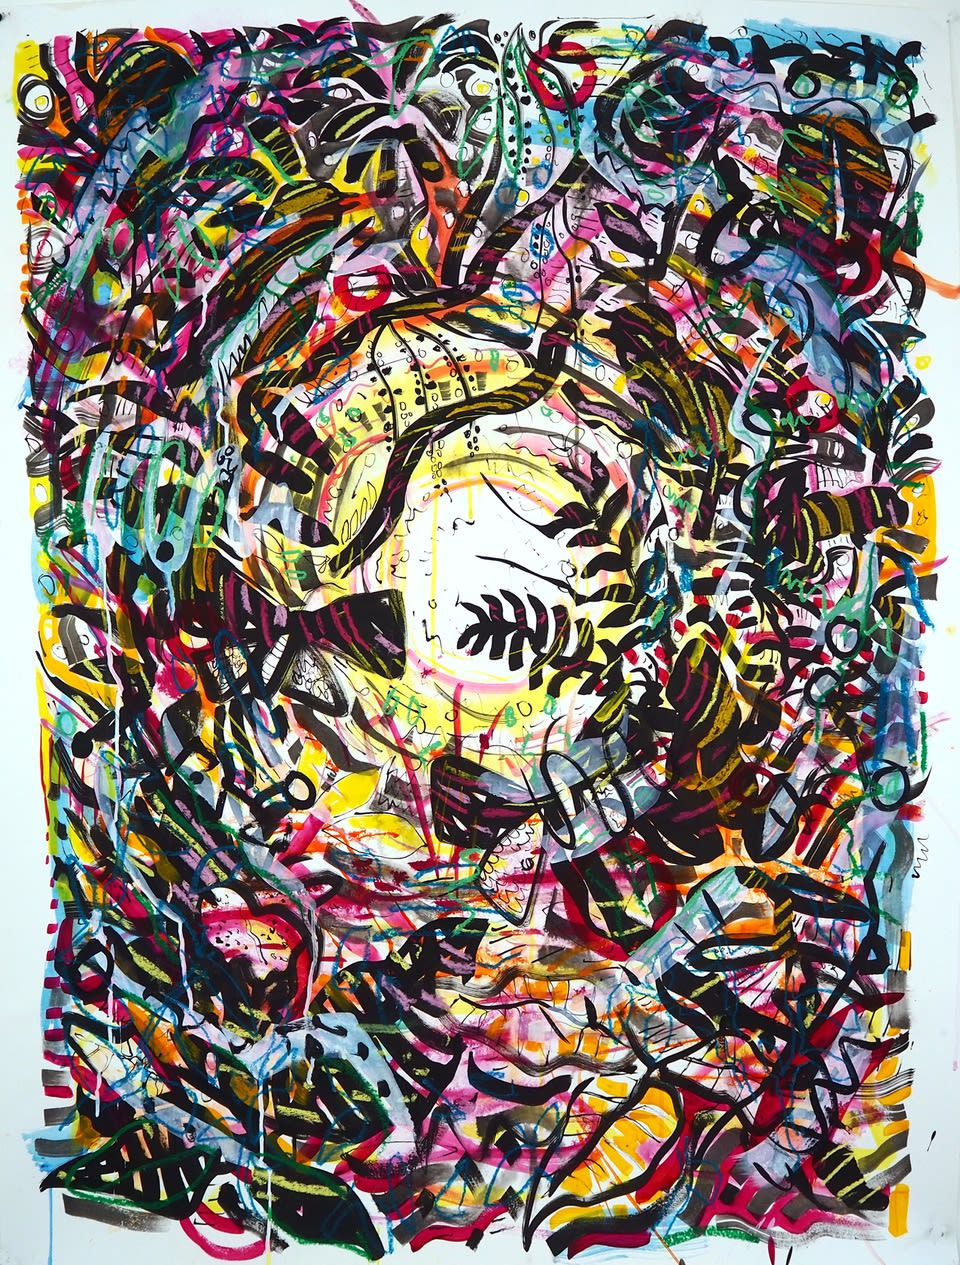 Jules Buck Jones, Cacophony, 2020 Watercolor, ink, pastel on paper, 50 x 38 in